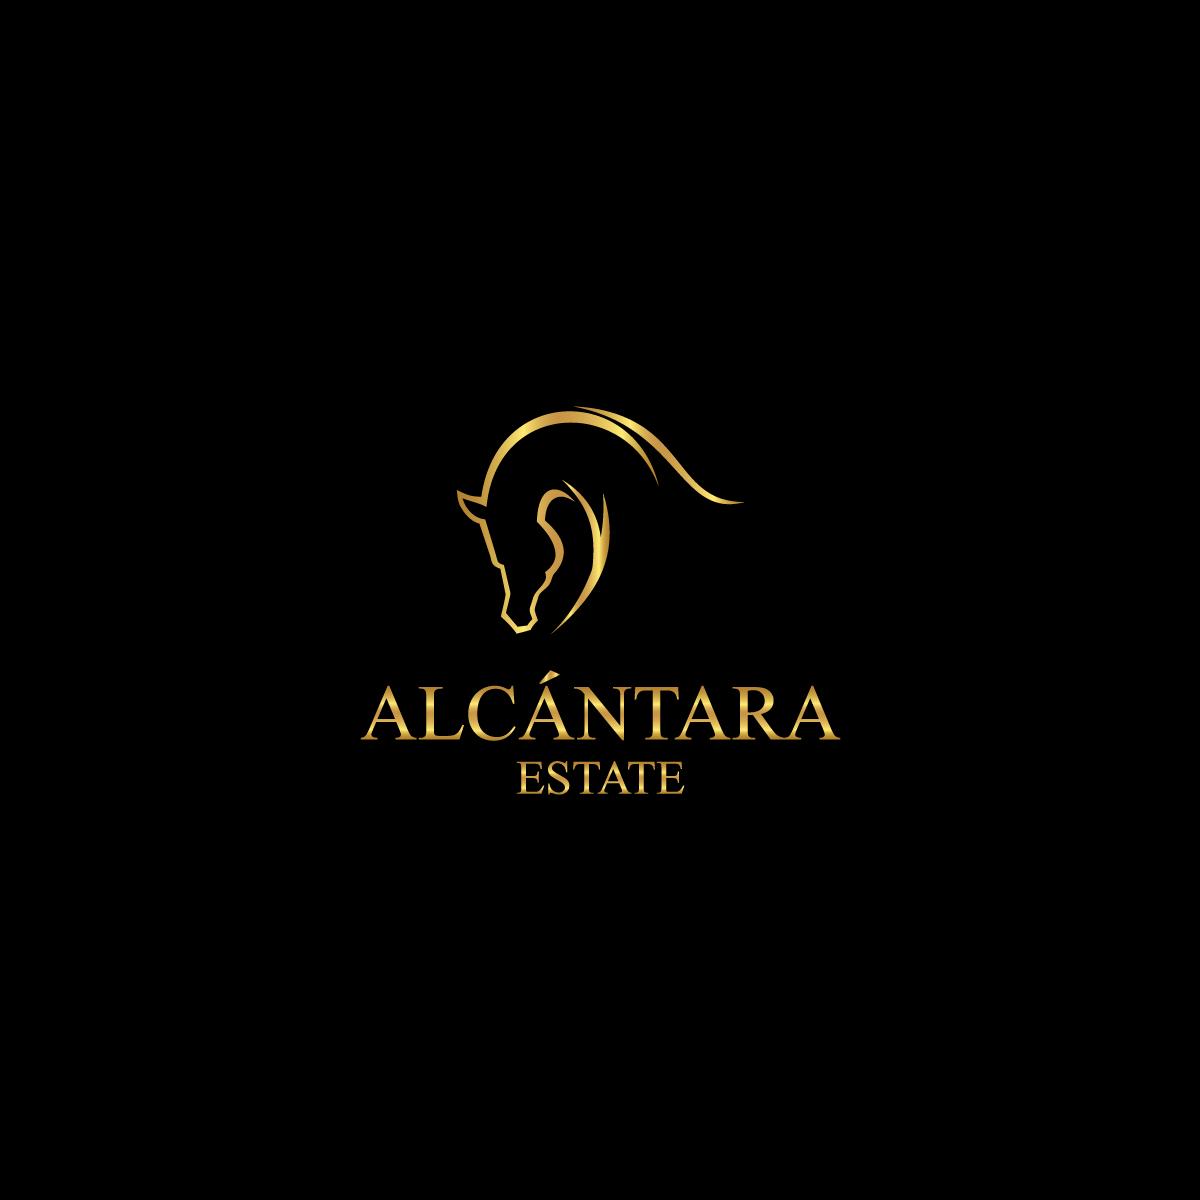 Serious Upmarket Logo Design Job Logo Brief For Alcantara Estate A Company In Australia